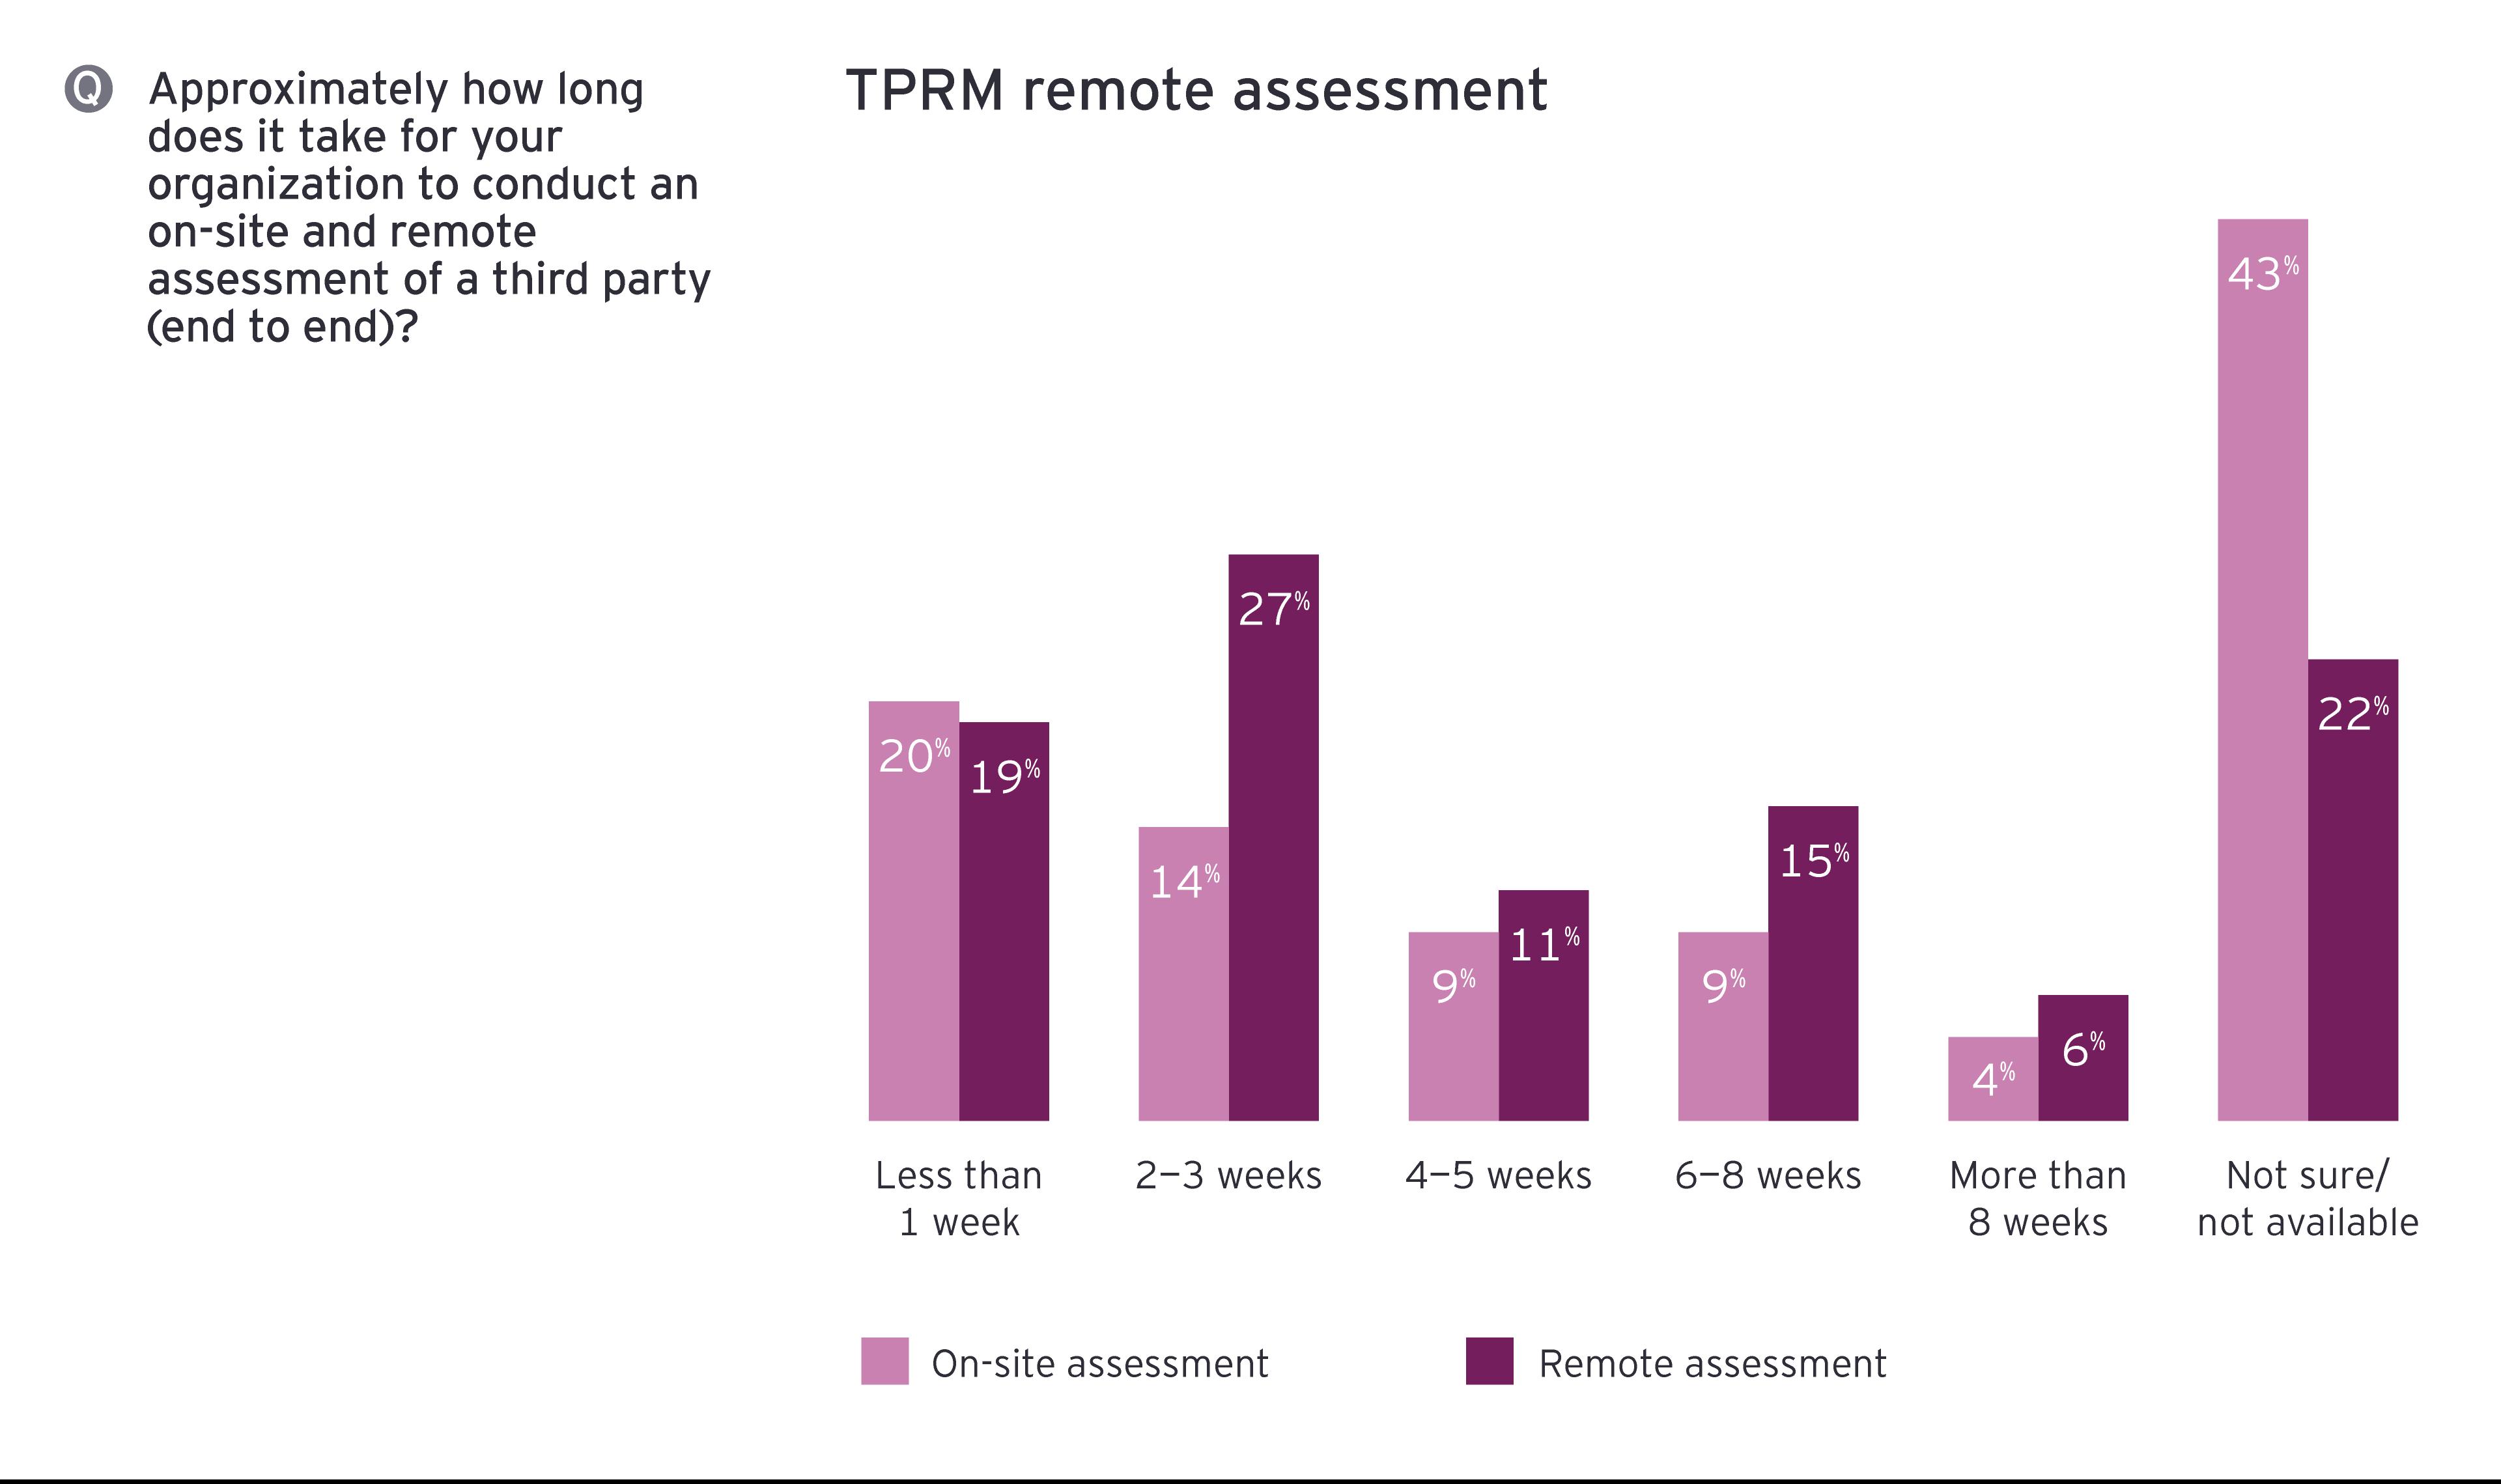 TPRM remote assessment